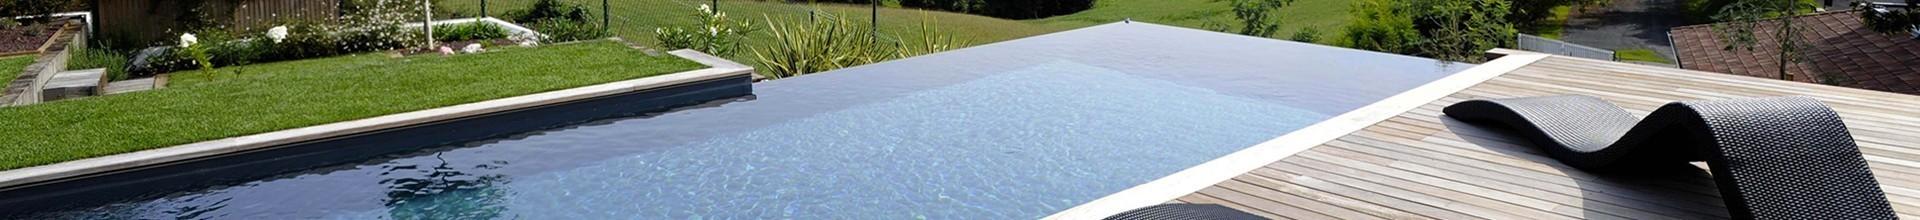 Direct usine, piscine coque prix Ixelles